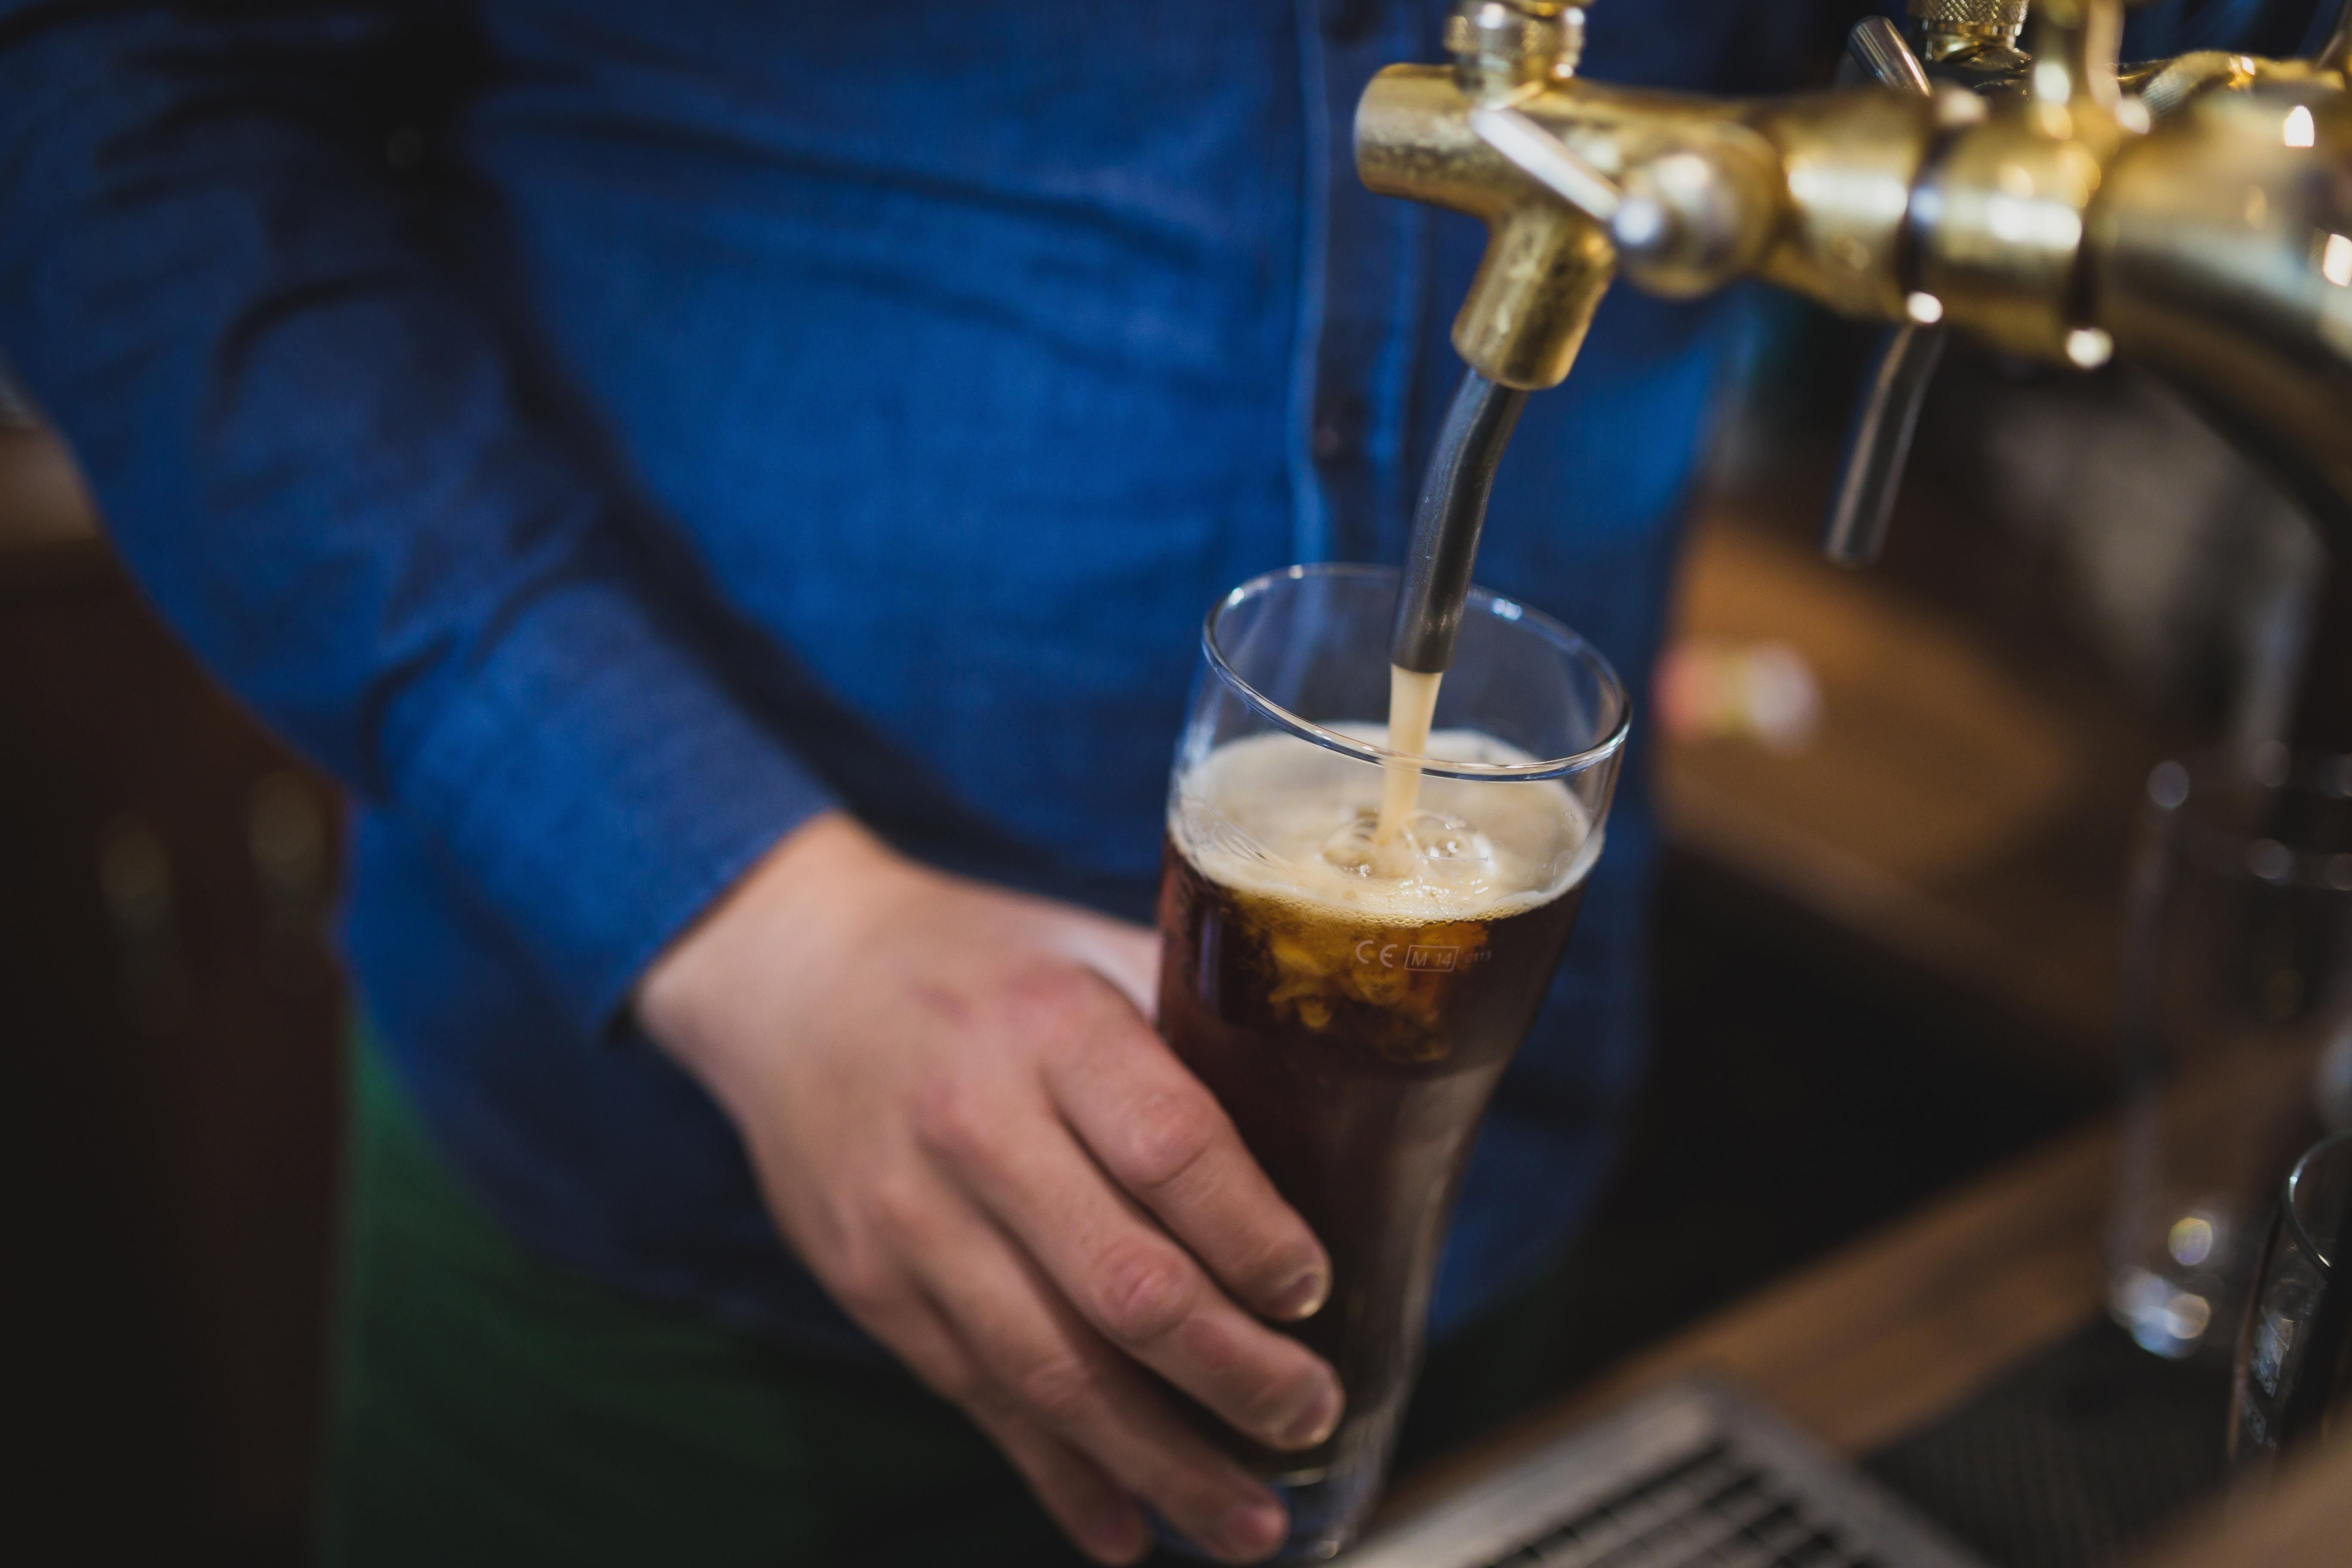 cervez artesanal